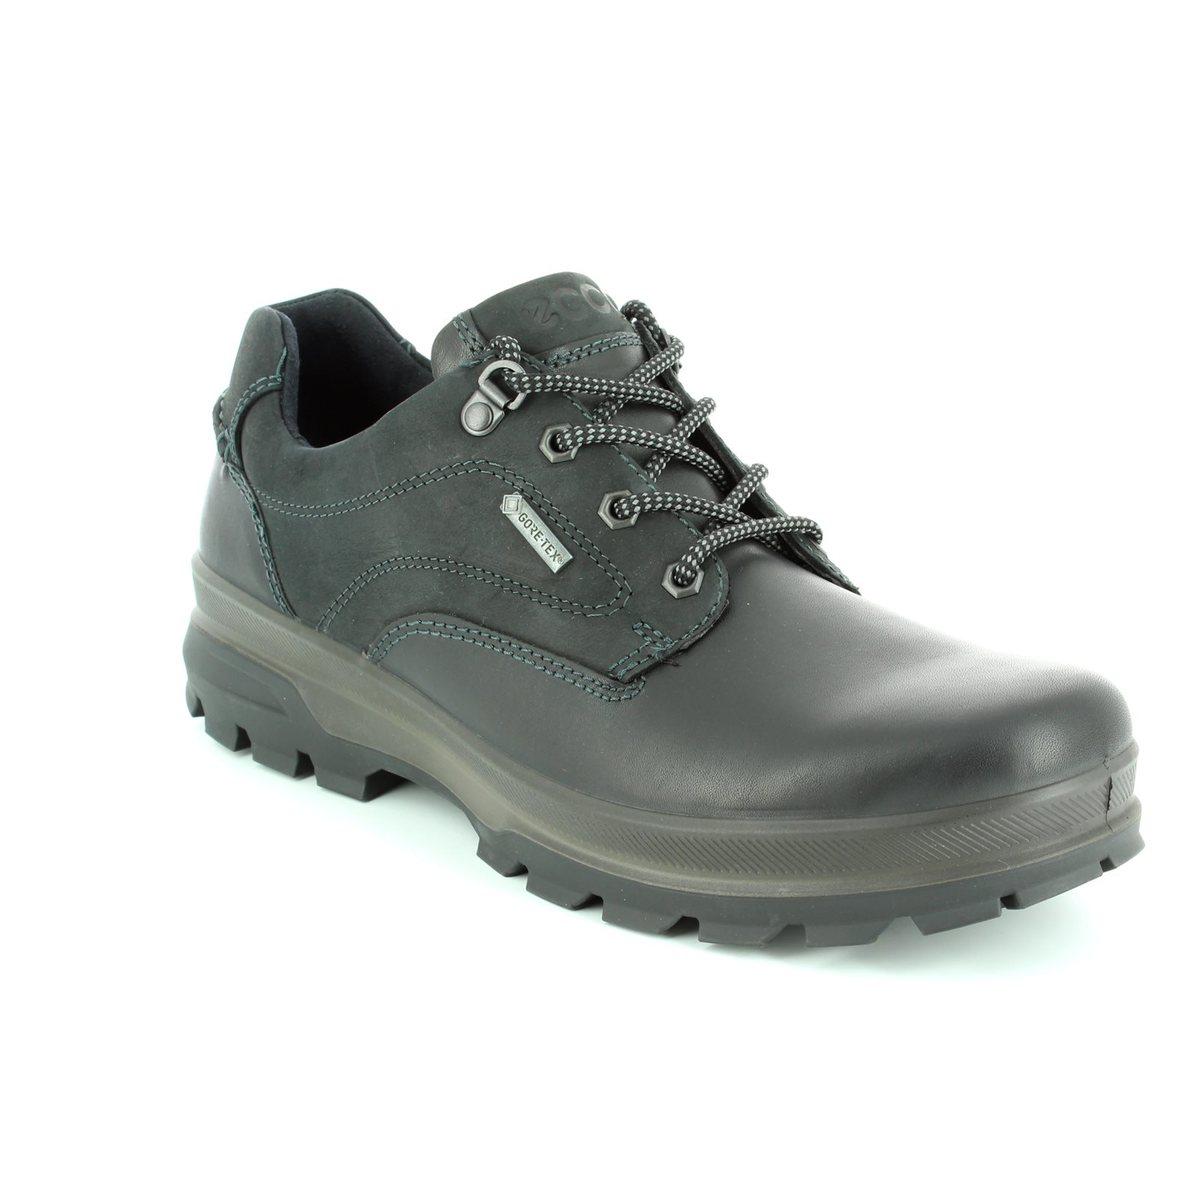 2b46ca8e551 838034/51707 Rugged Gore-tex at Begg Shoes & Bags